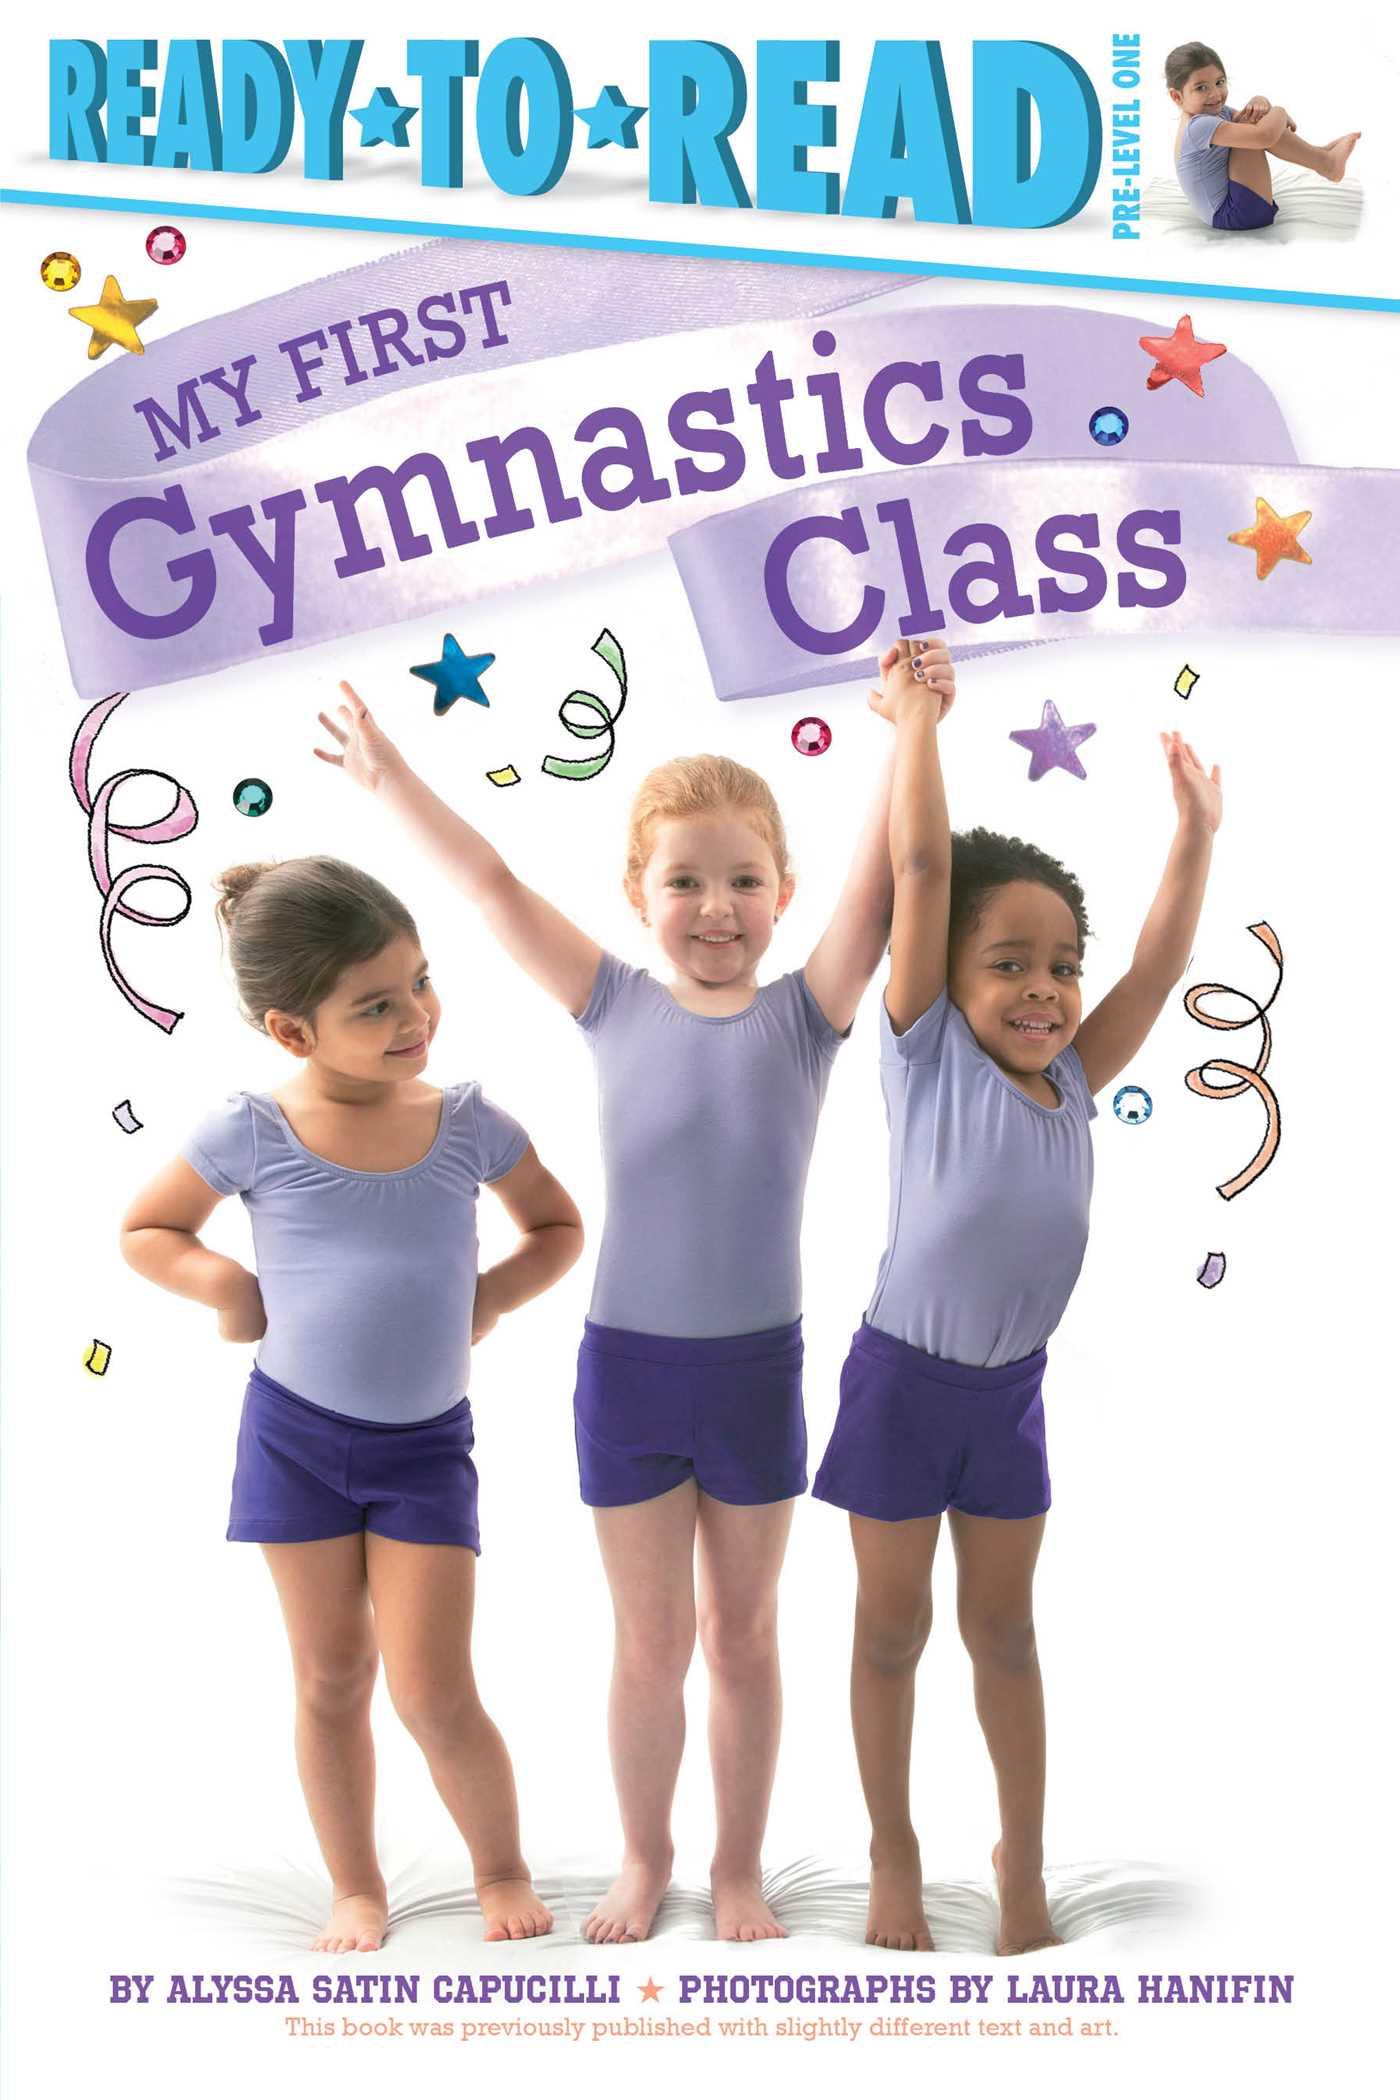 My first gymnastics class 9781481461870 hr